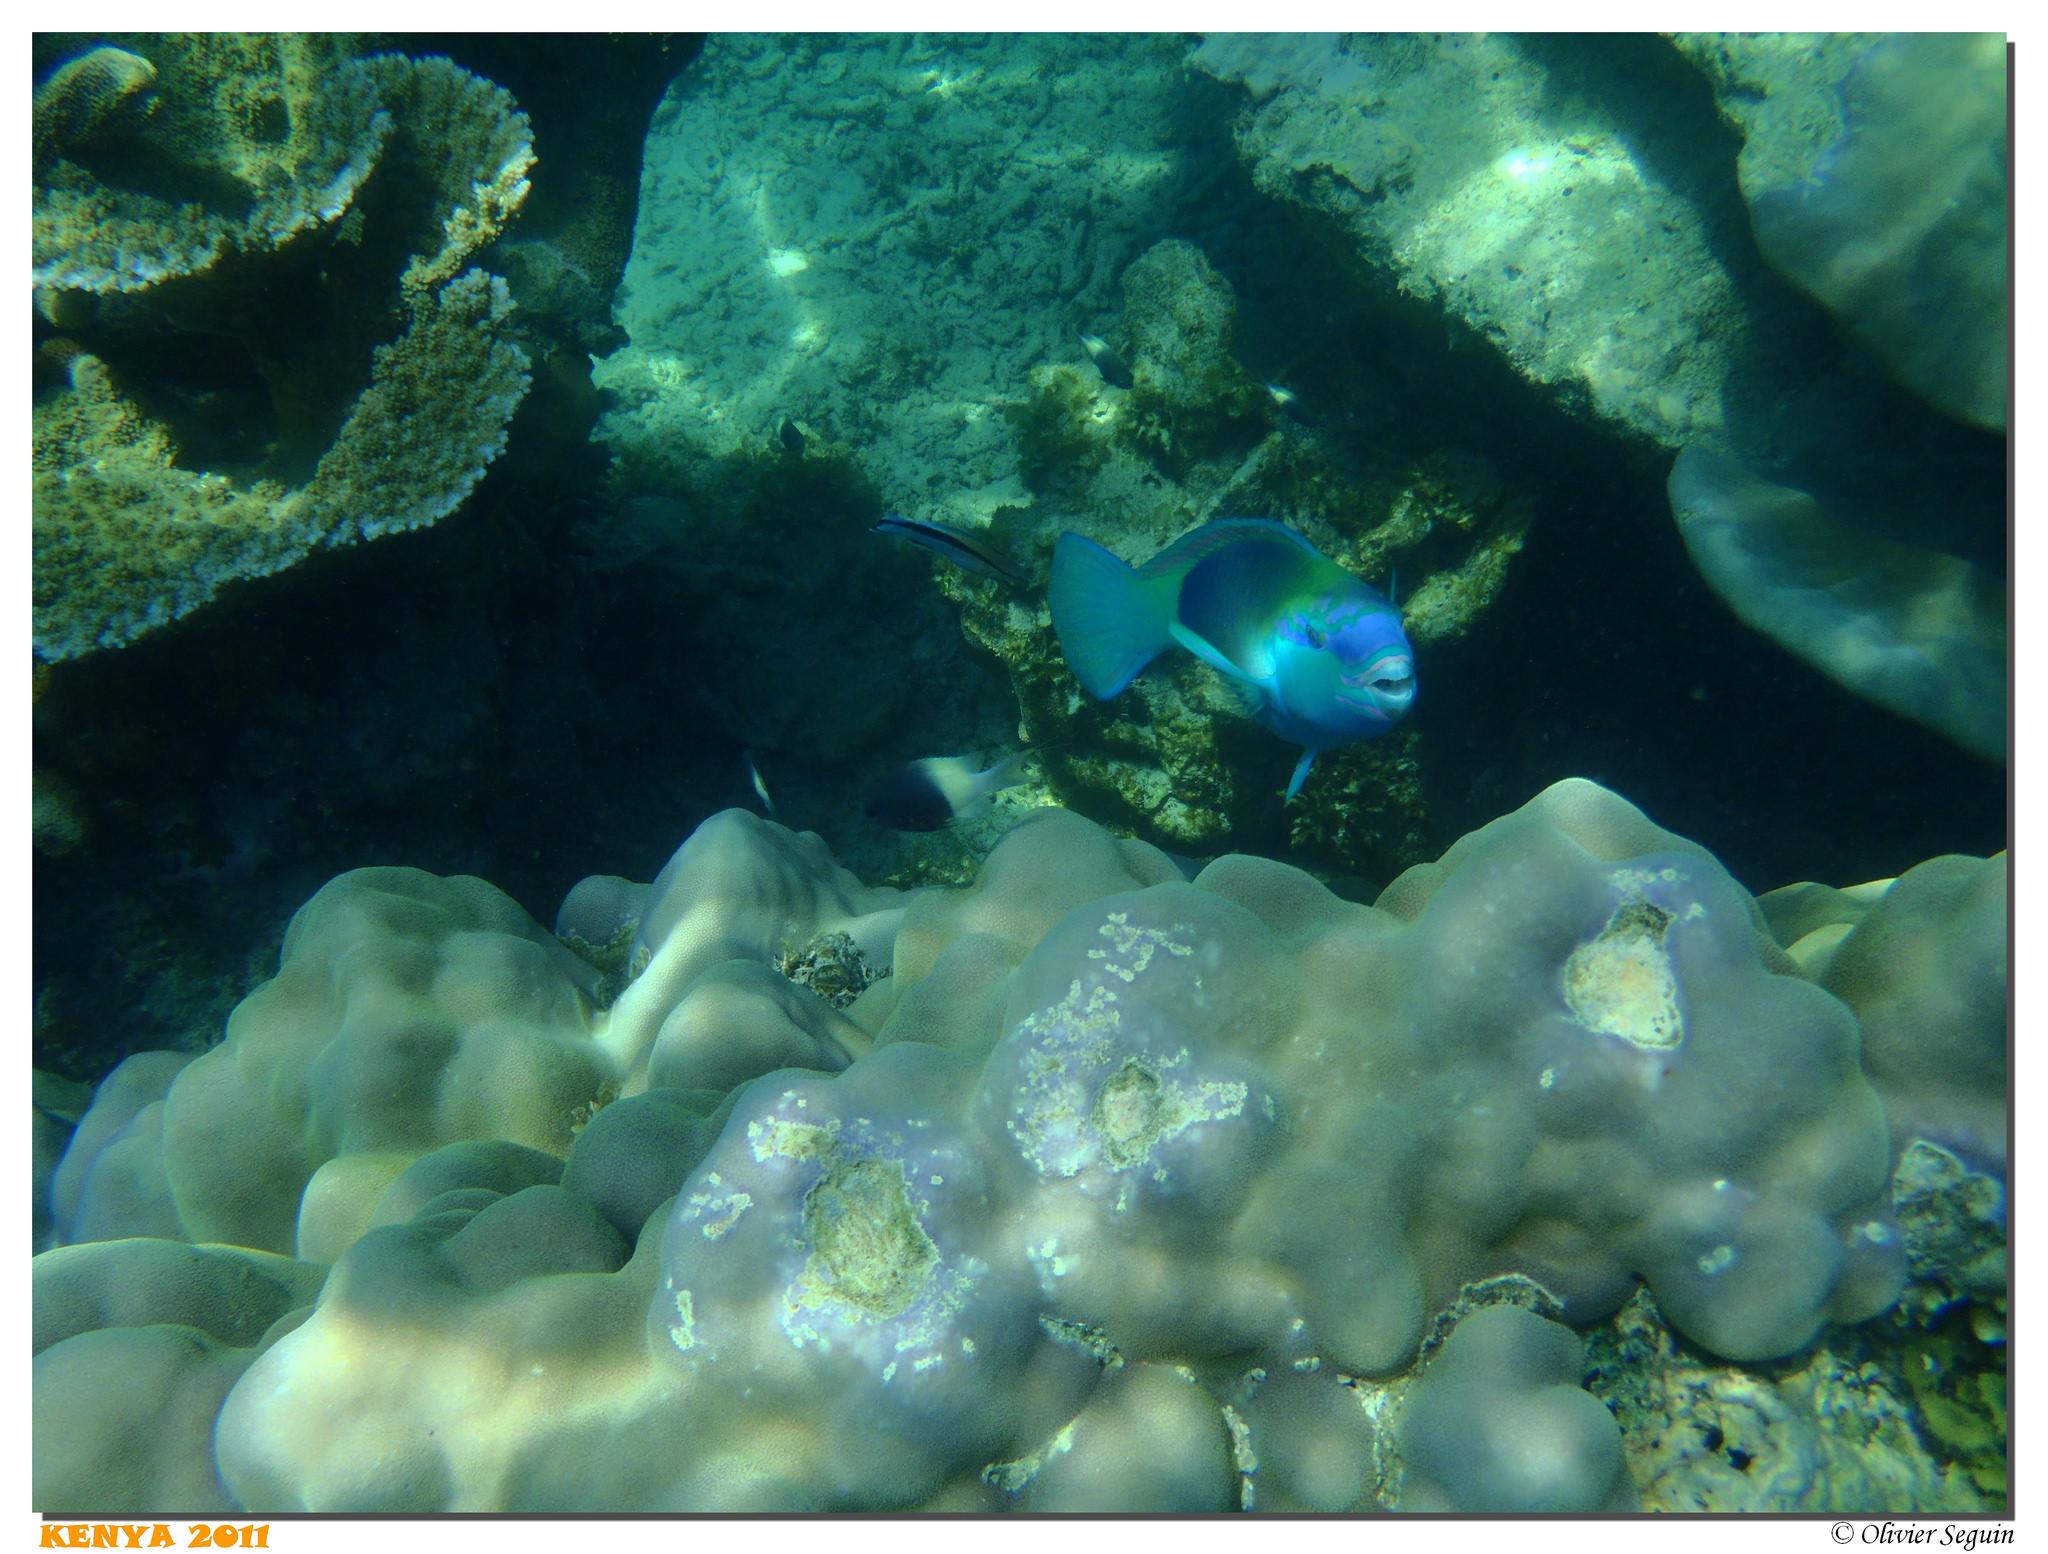 Kenya - Wasini - Snorkeling - Poisson Perroquet Photo by: Olivier Seguin Link: https://flic.kr/p/oDm5JA